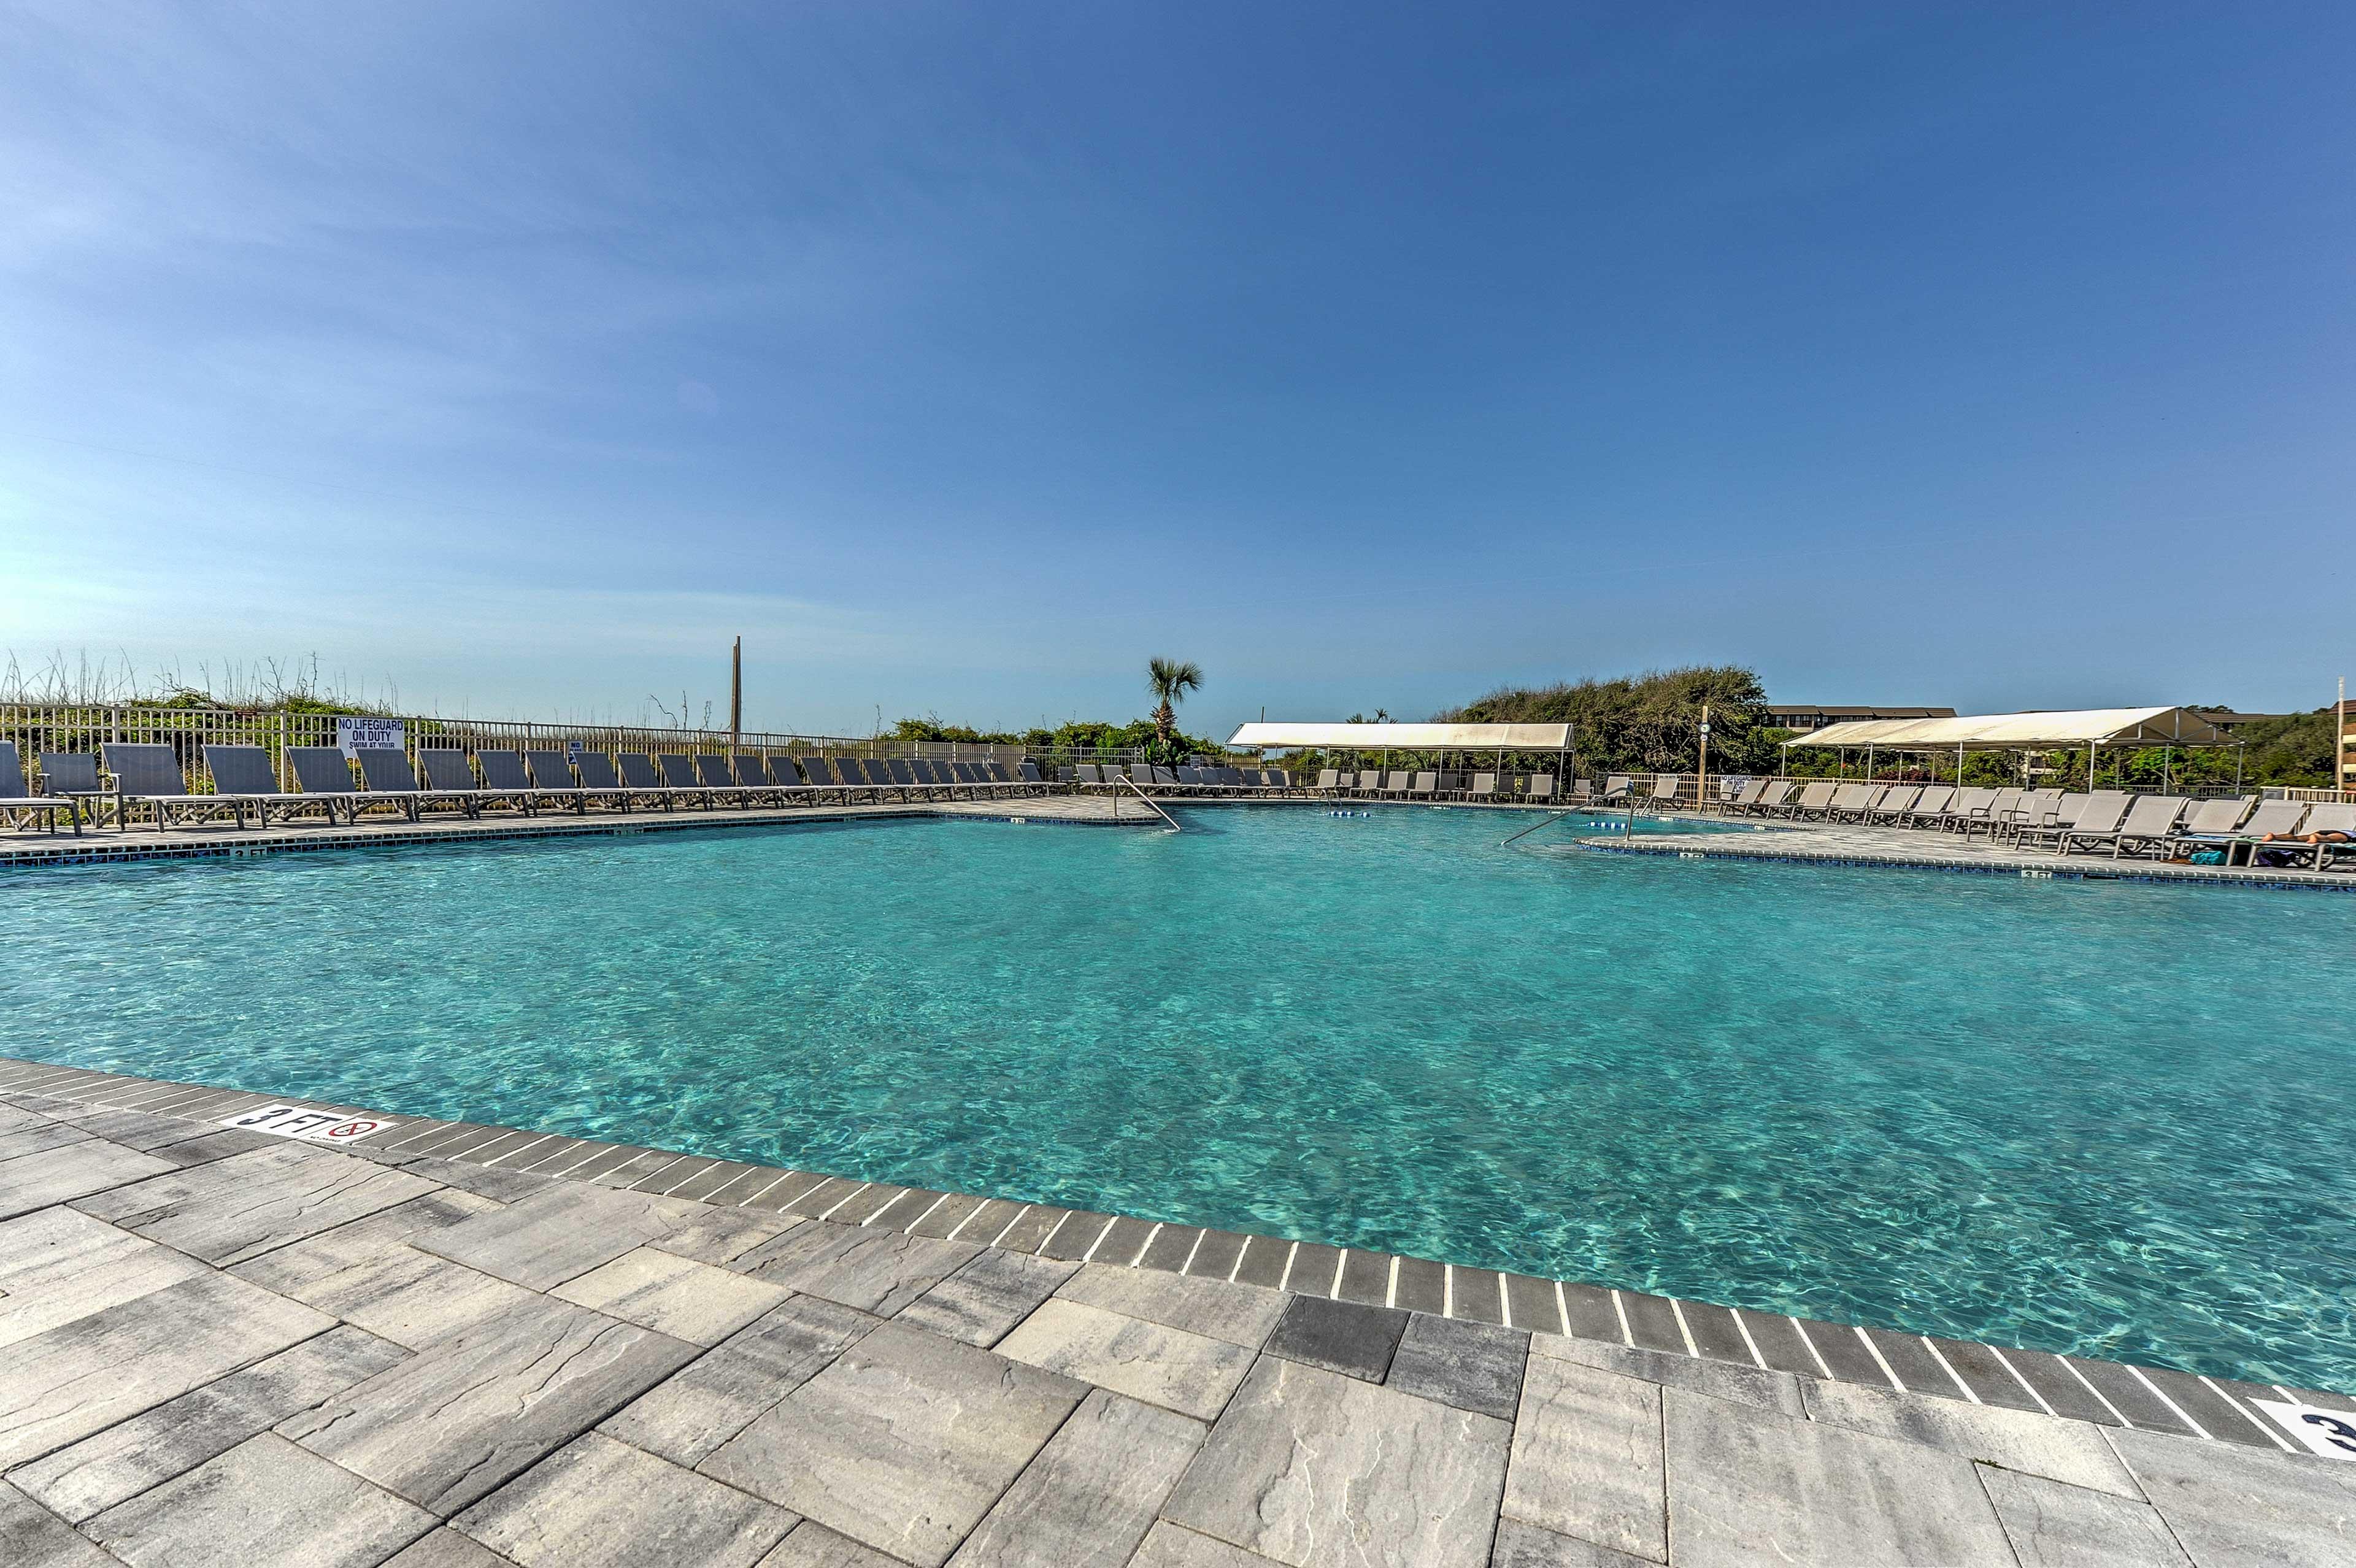 Book this Hilton Head Island Beach & Tennis Club vacation rental condo today!